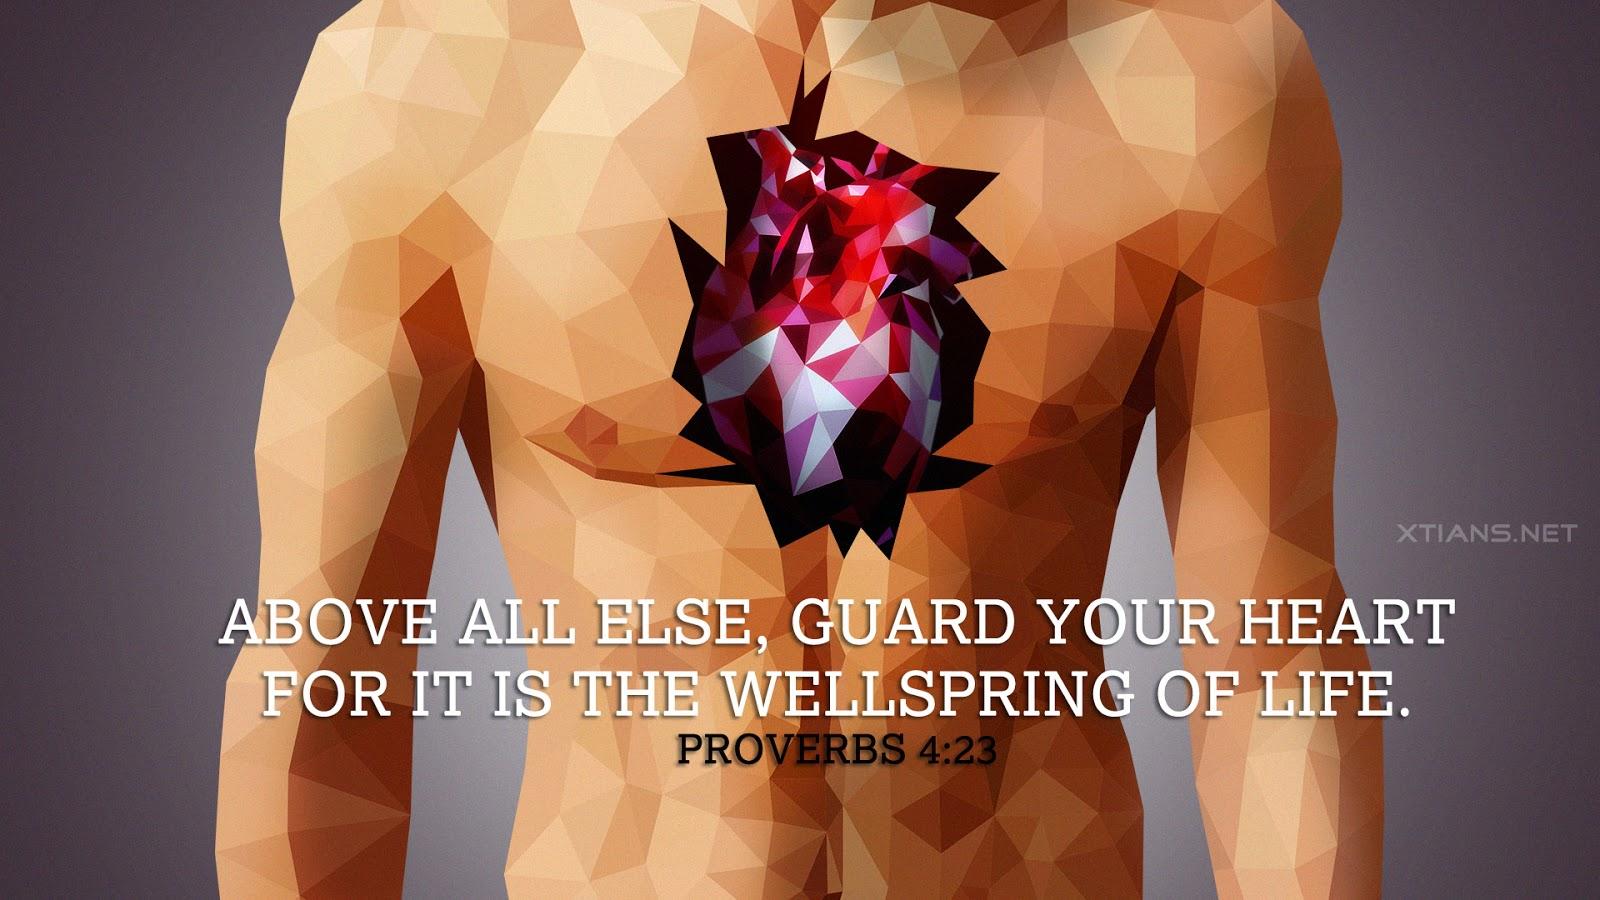 Wallpaper - Guard your heart